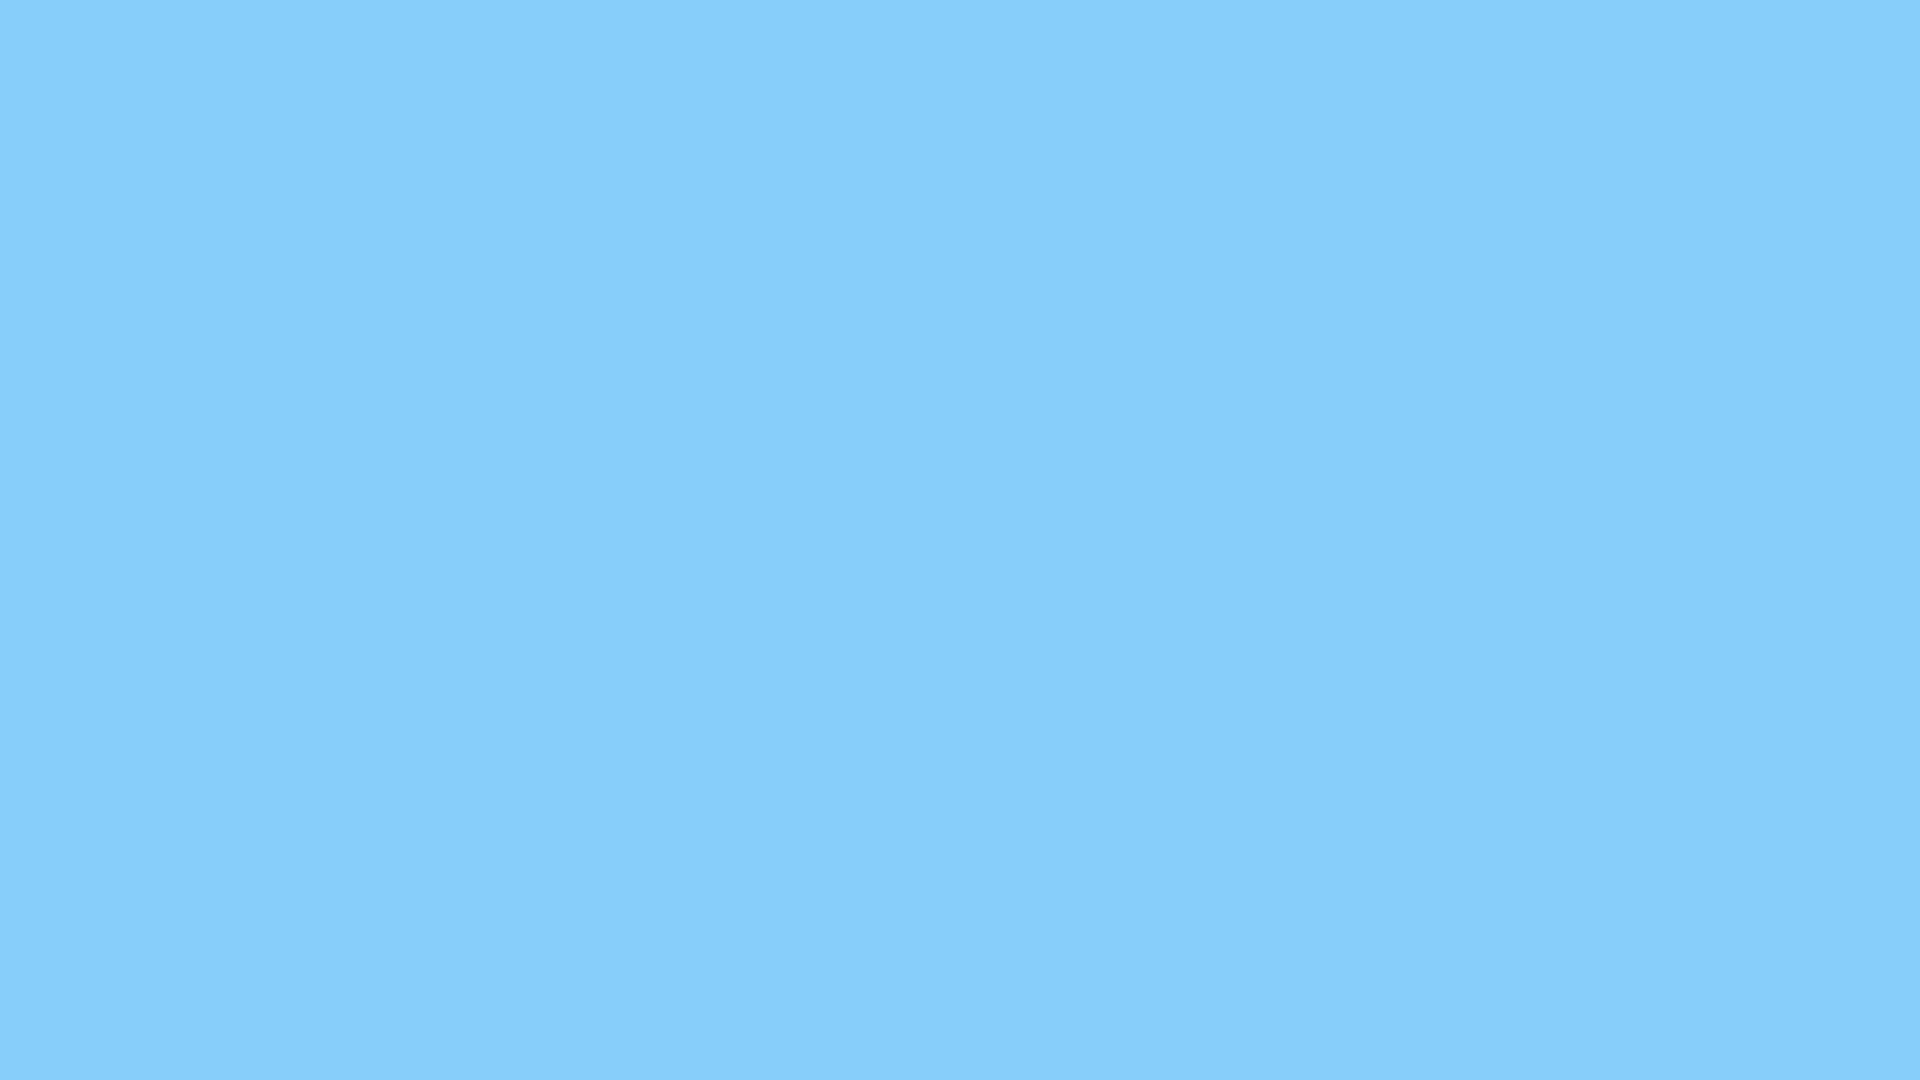 best blue light of vista desktop wallpapers background collection 1920x1080